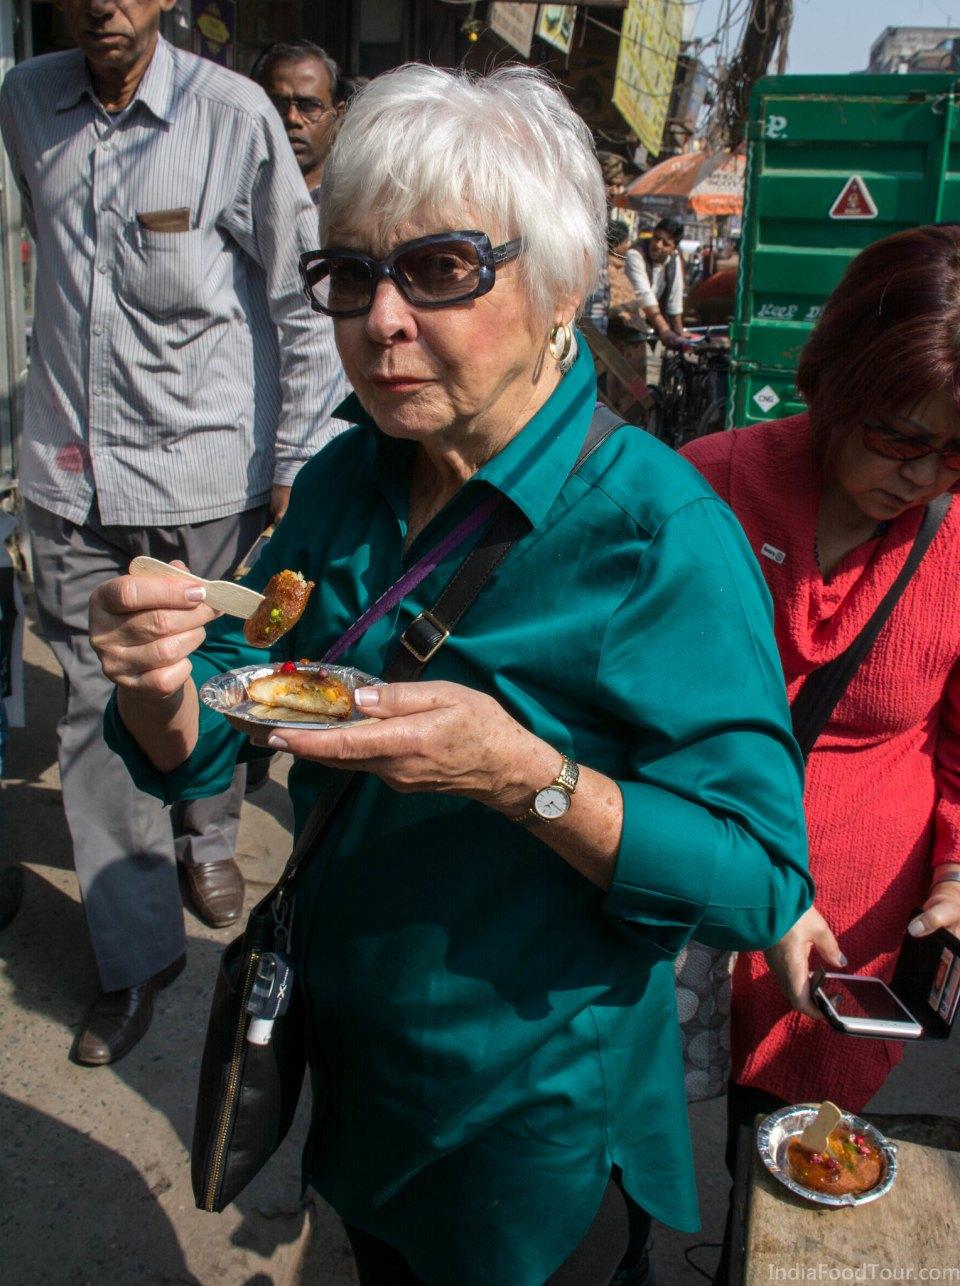 Getting a taste of freshly fried Aaloo tikkii served with mint and tamarind chutneys in old Delhi's food walk